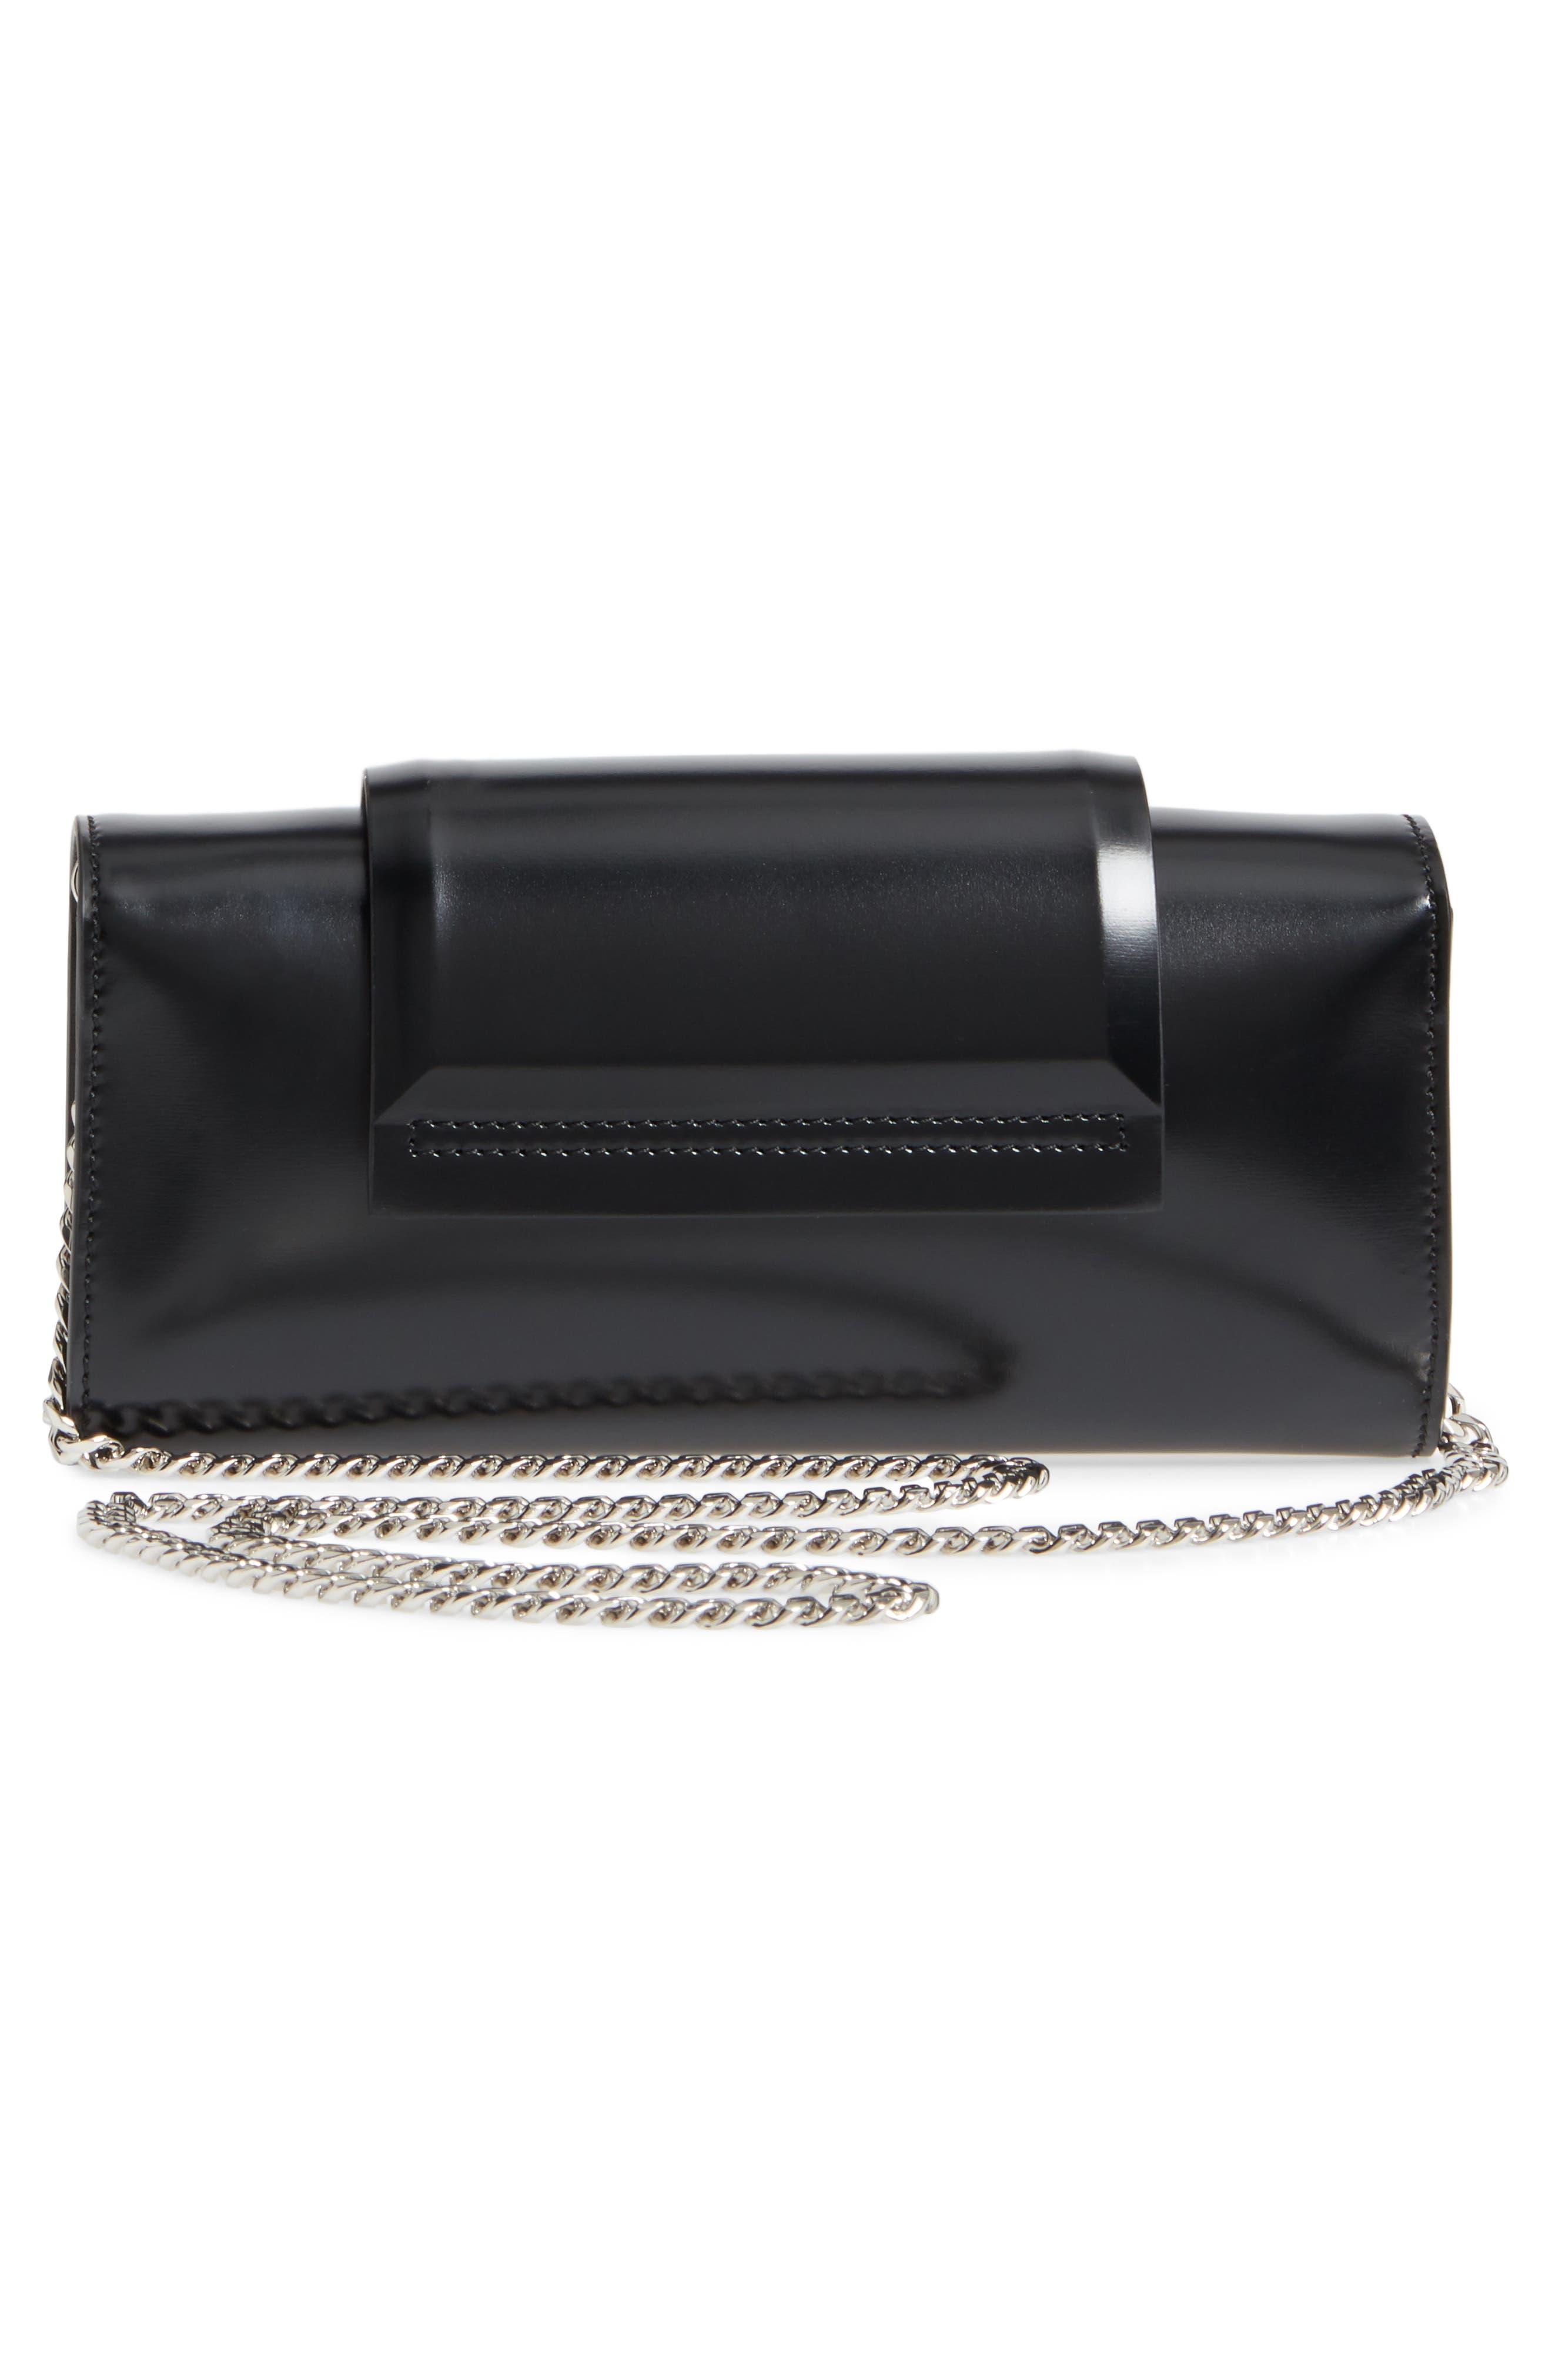 Mini Infinity Calfskin Leather Shoulder/Crossbody Bag,                             Alternate thumbnail 3, color,                             001